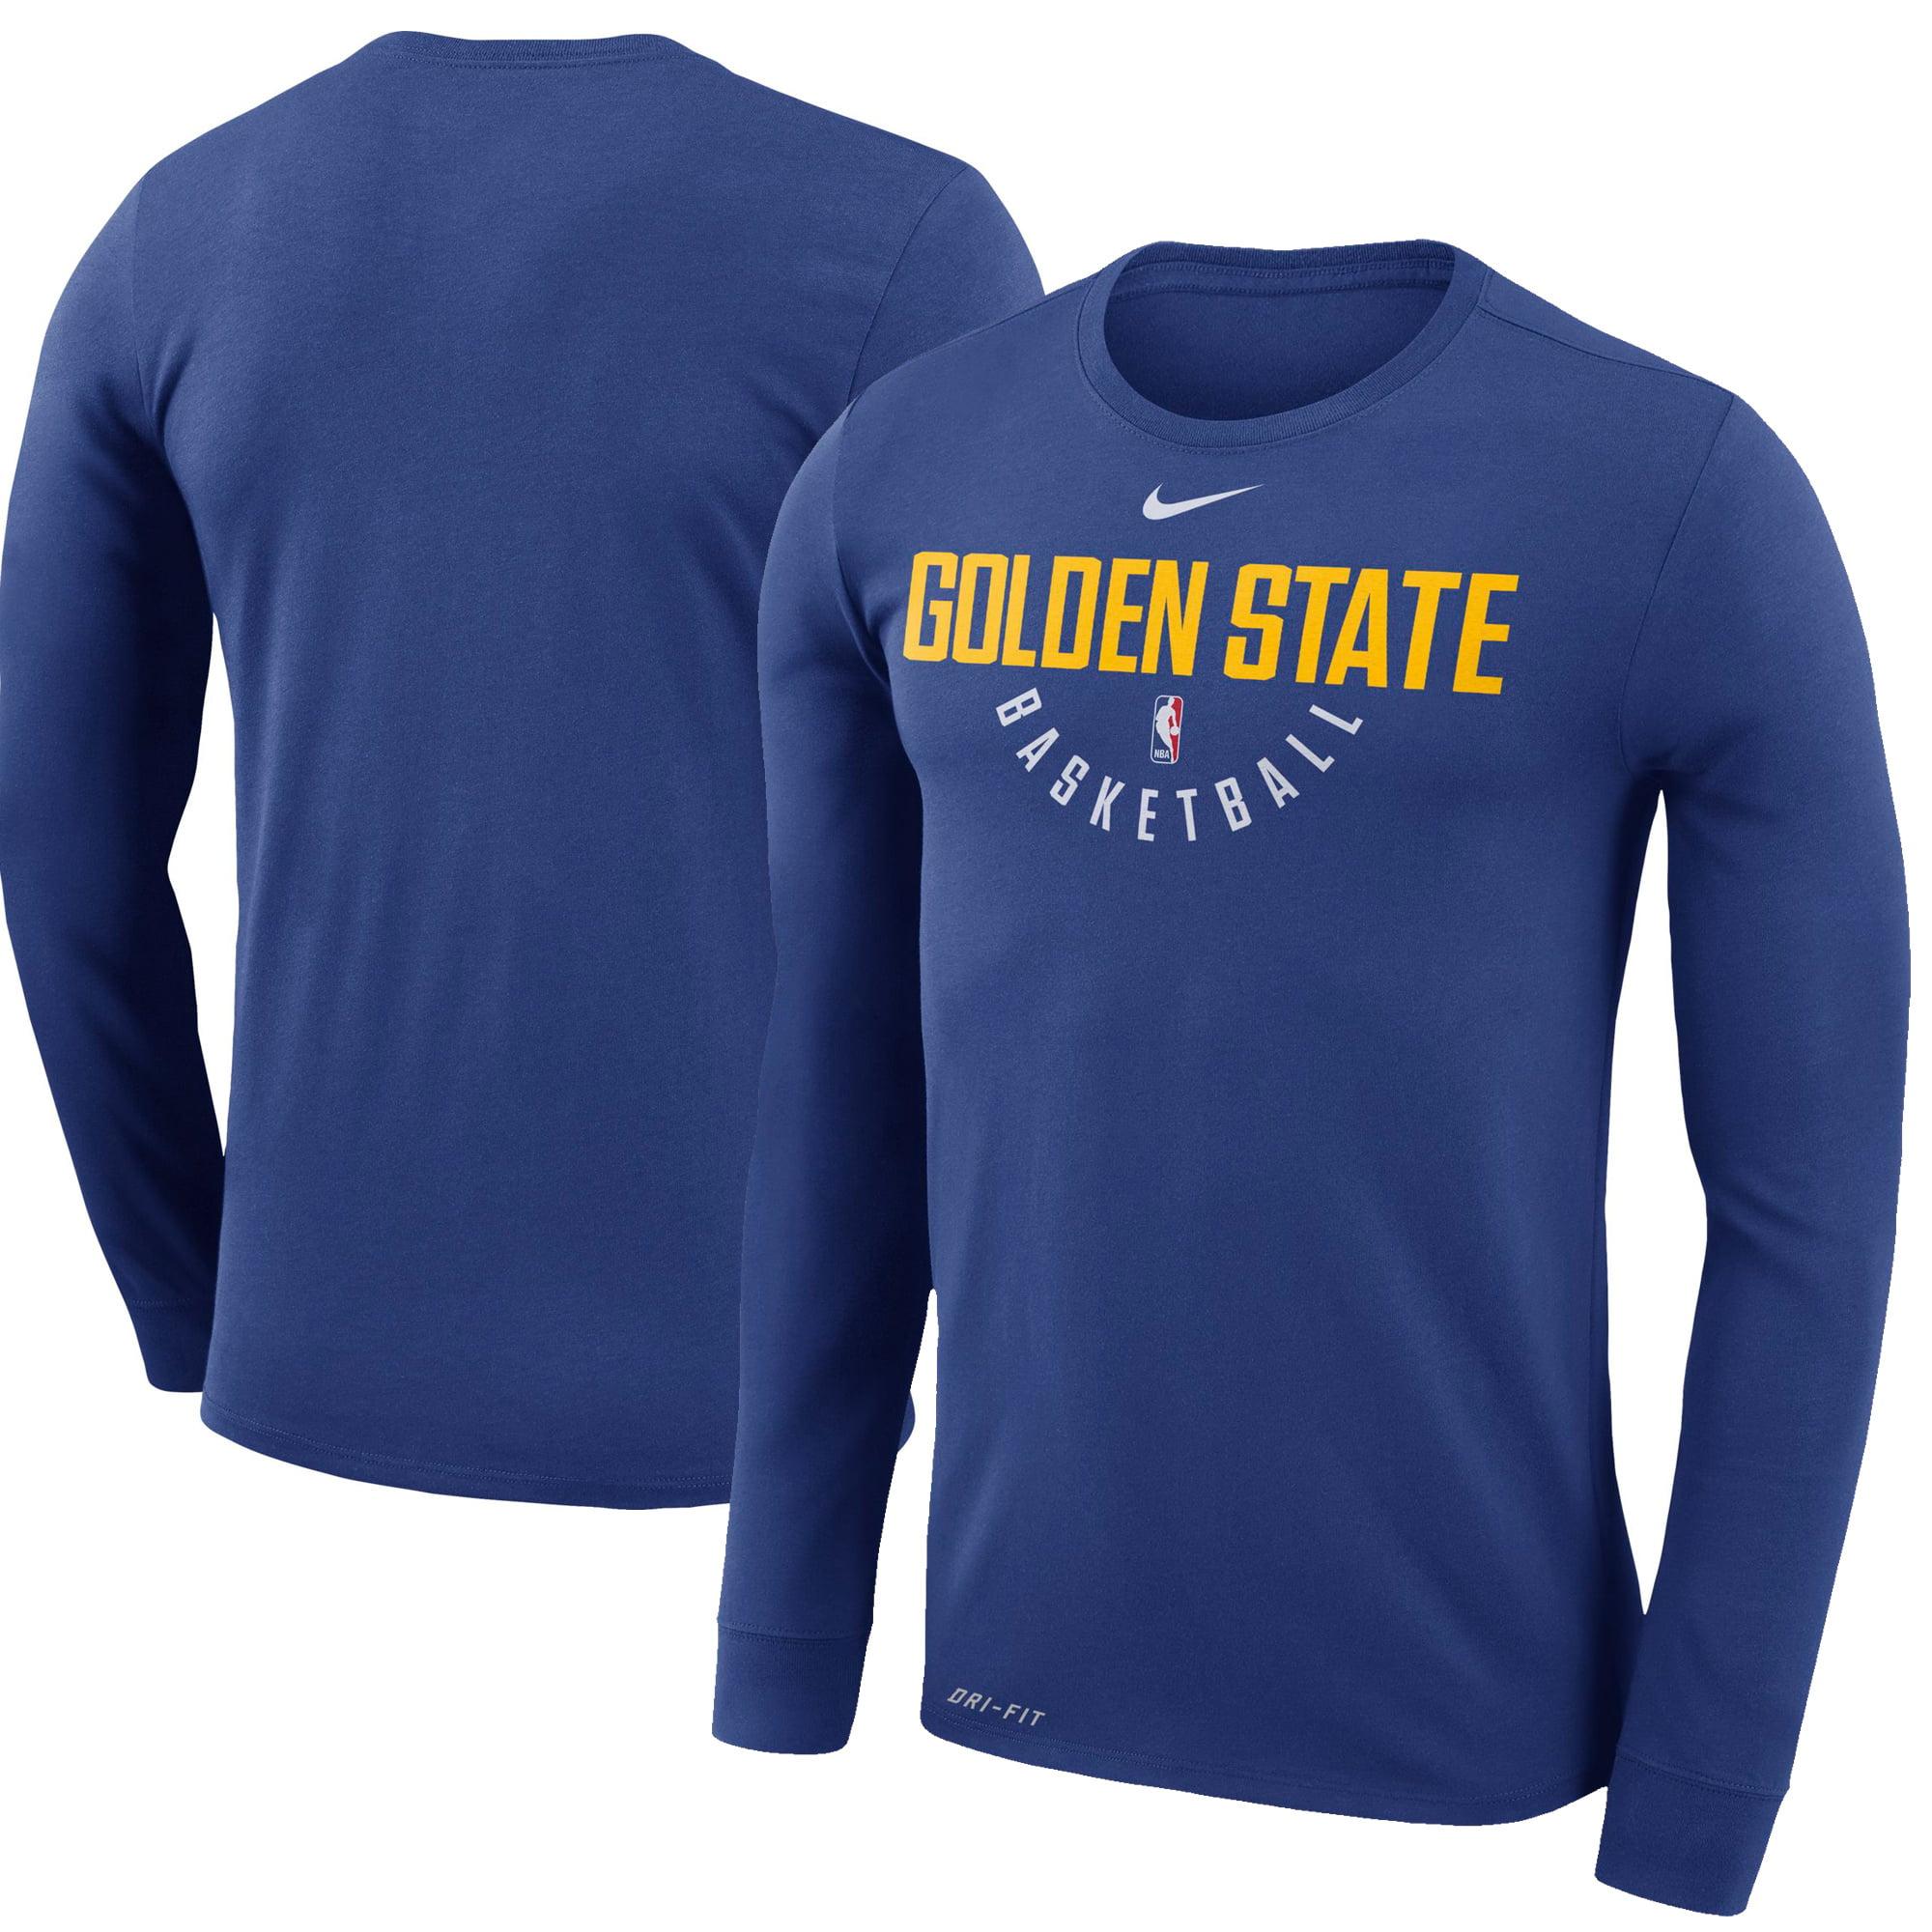 Golden State Warriors Nike Practice Long Sleeve Performance T-Shirt - Royal